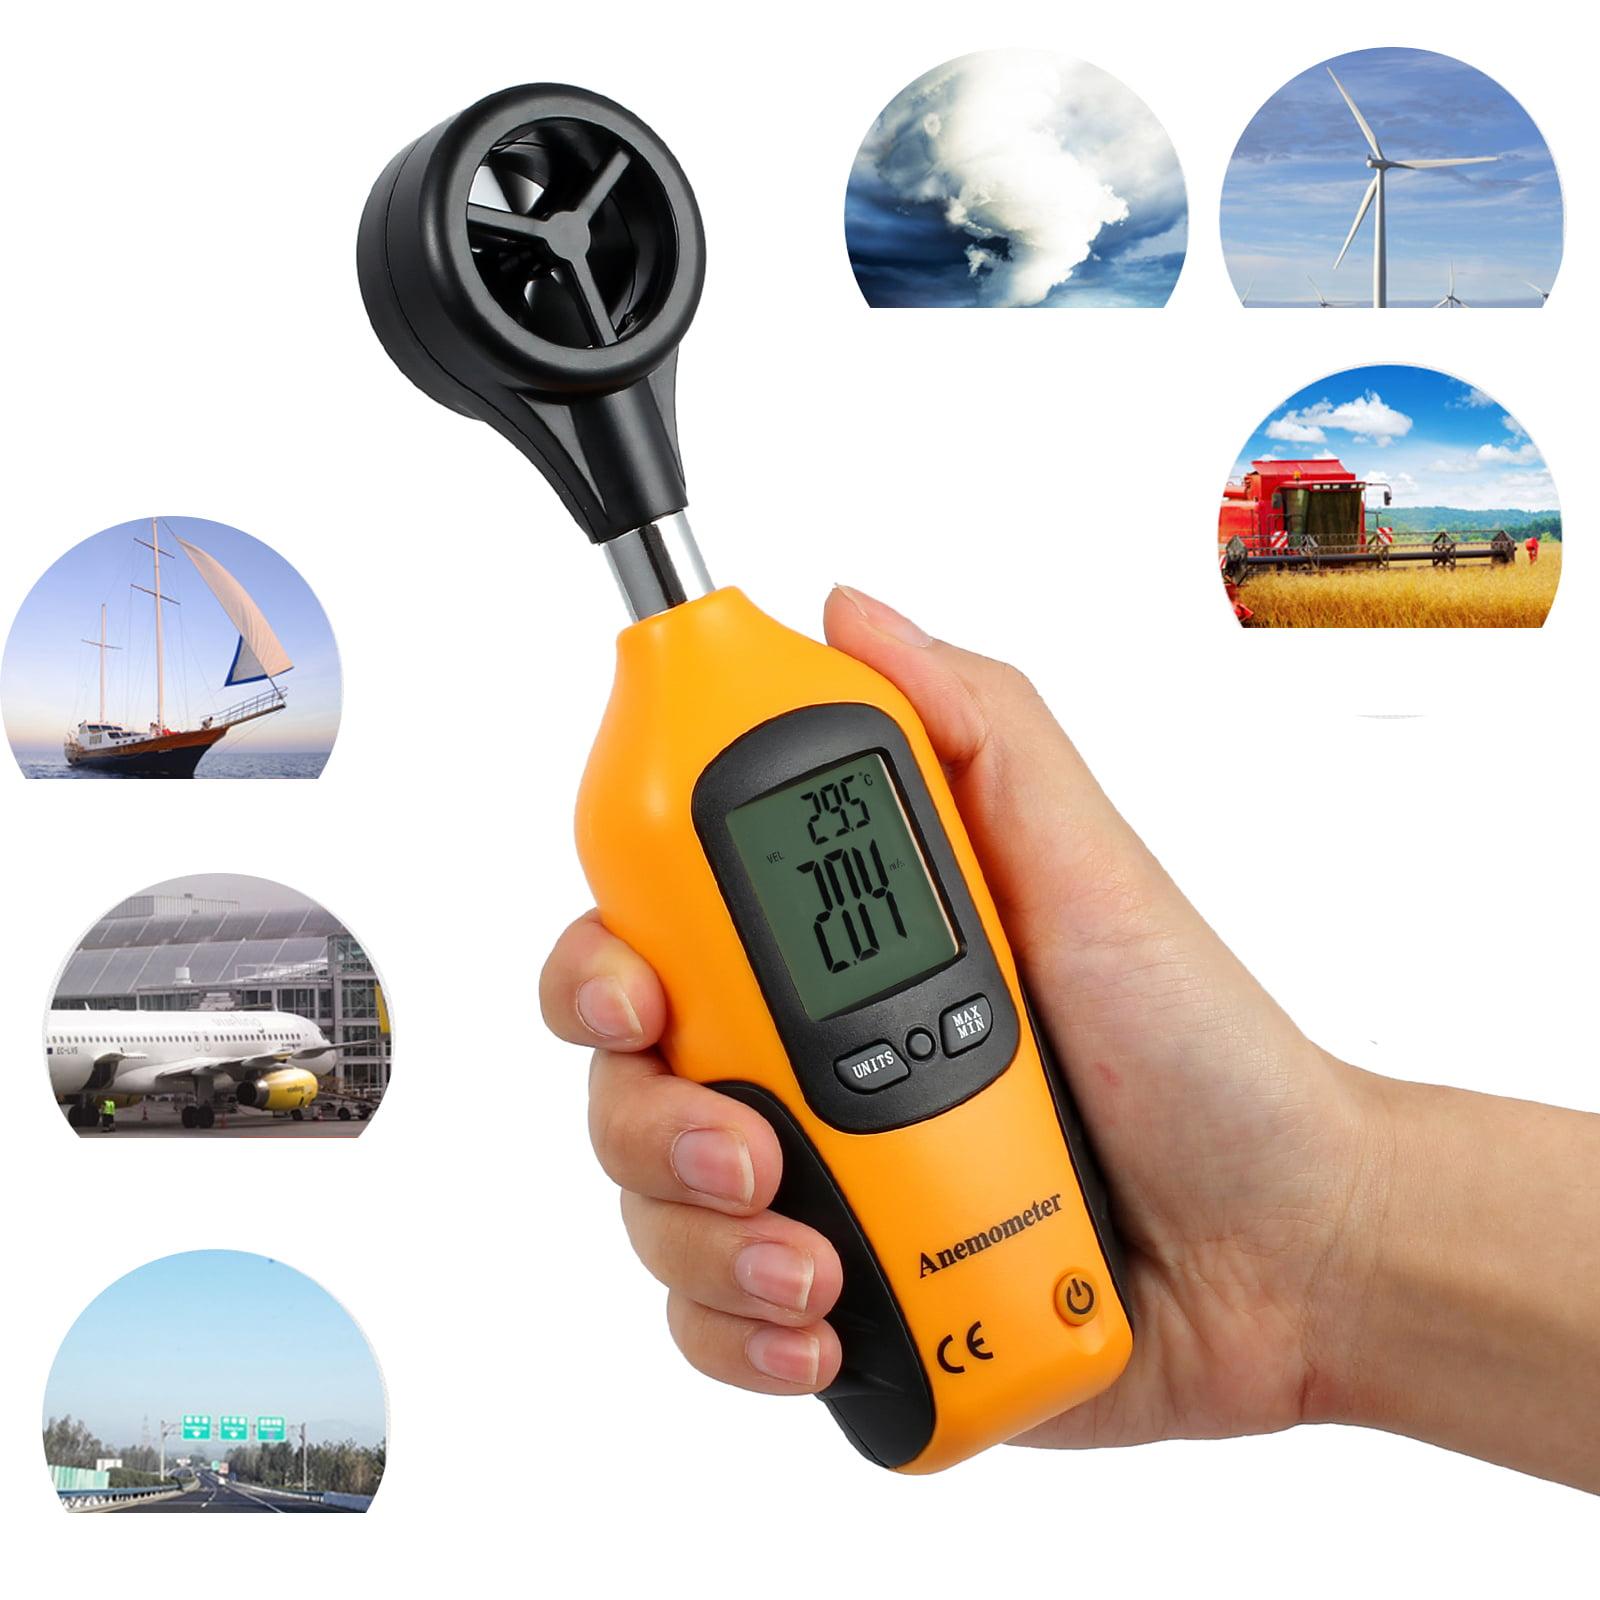 Digital Anemometer Vane Wind Speed Measurement ET-955 CFM//CMM Thermo Anemometer for Wind Speed Gauge Meter Temperature Scale